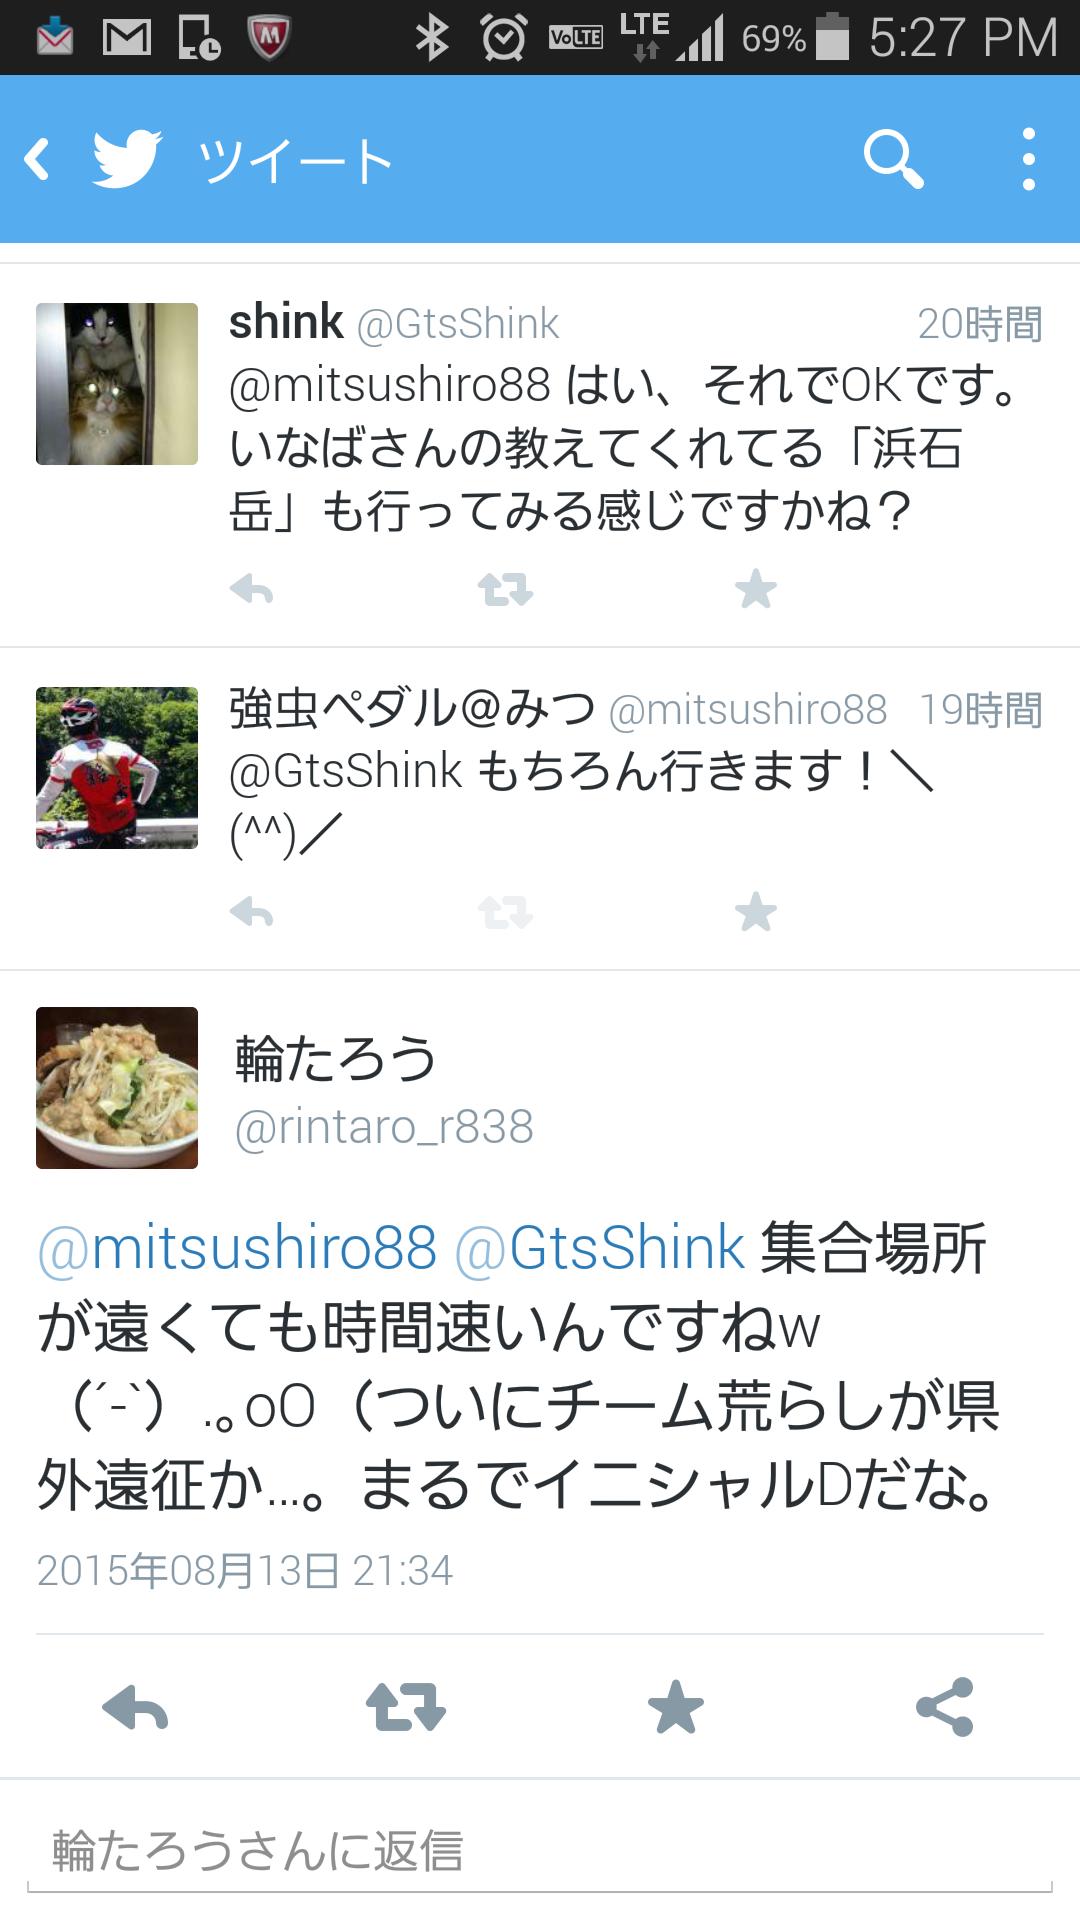 Screenshot_2015-08-14-17-27-32-1.png